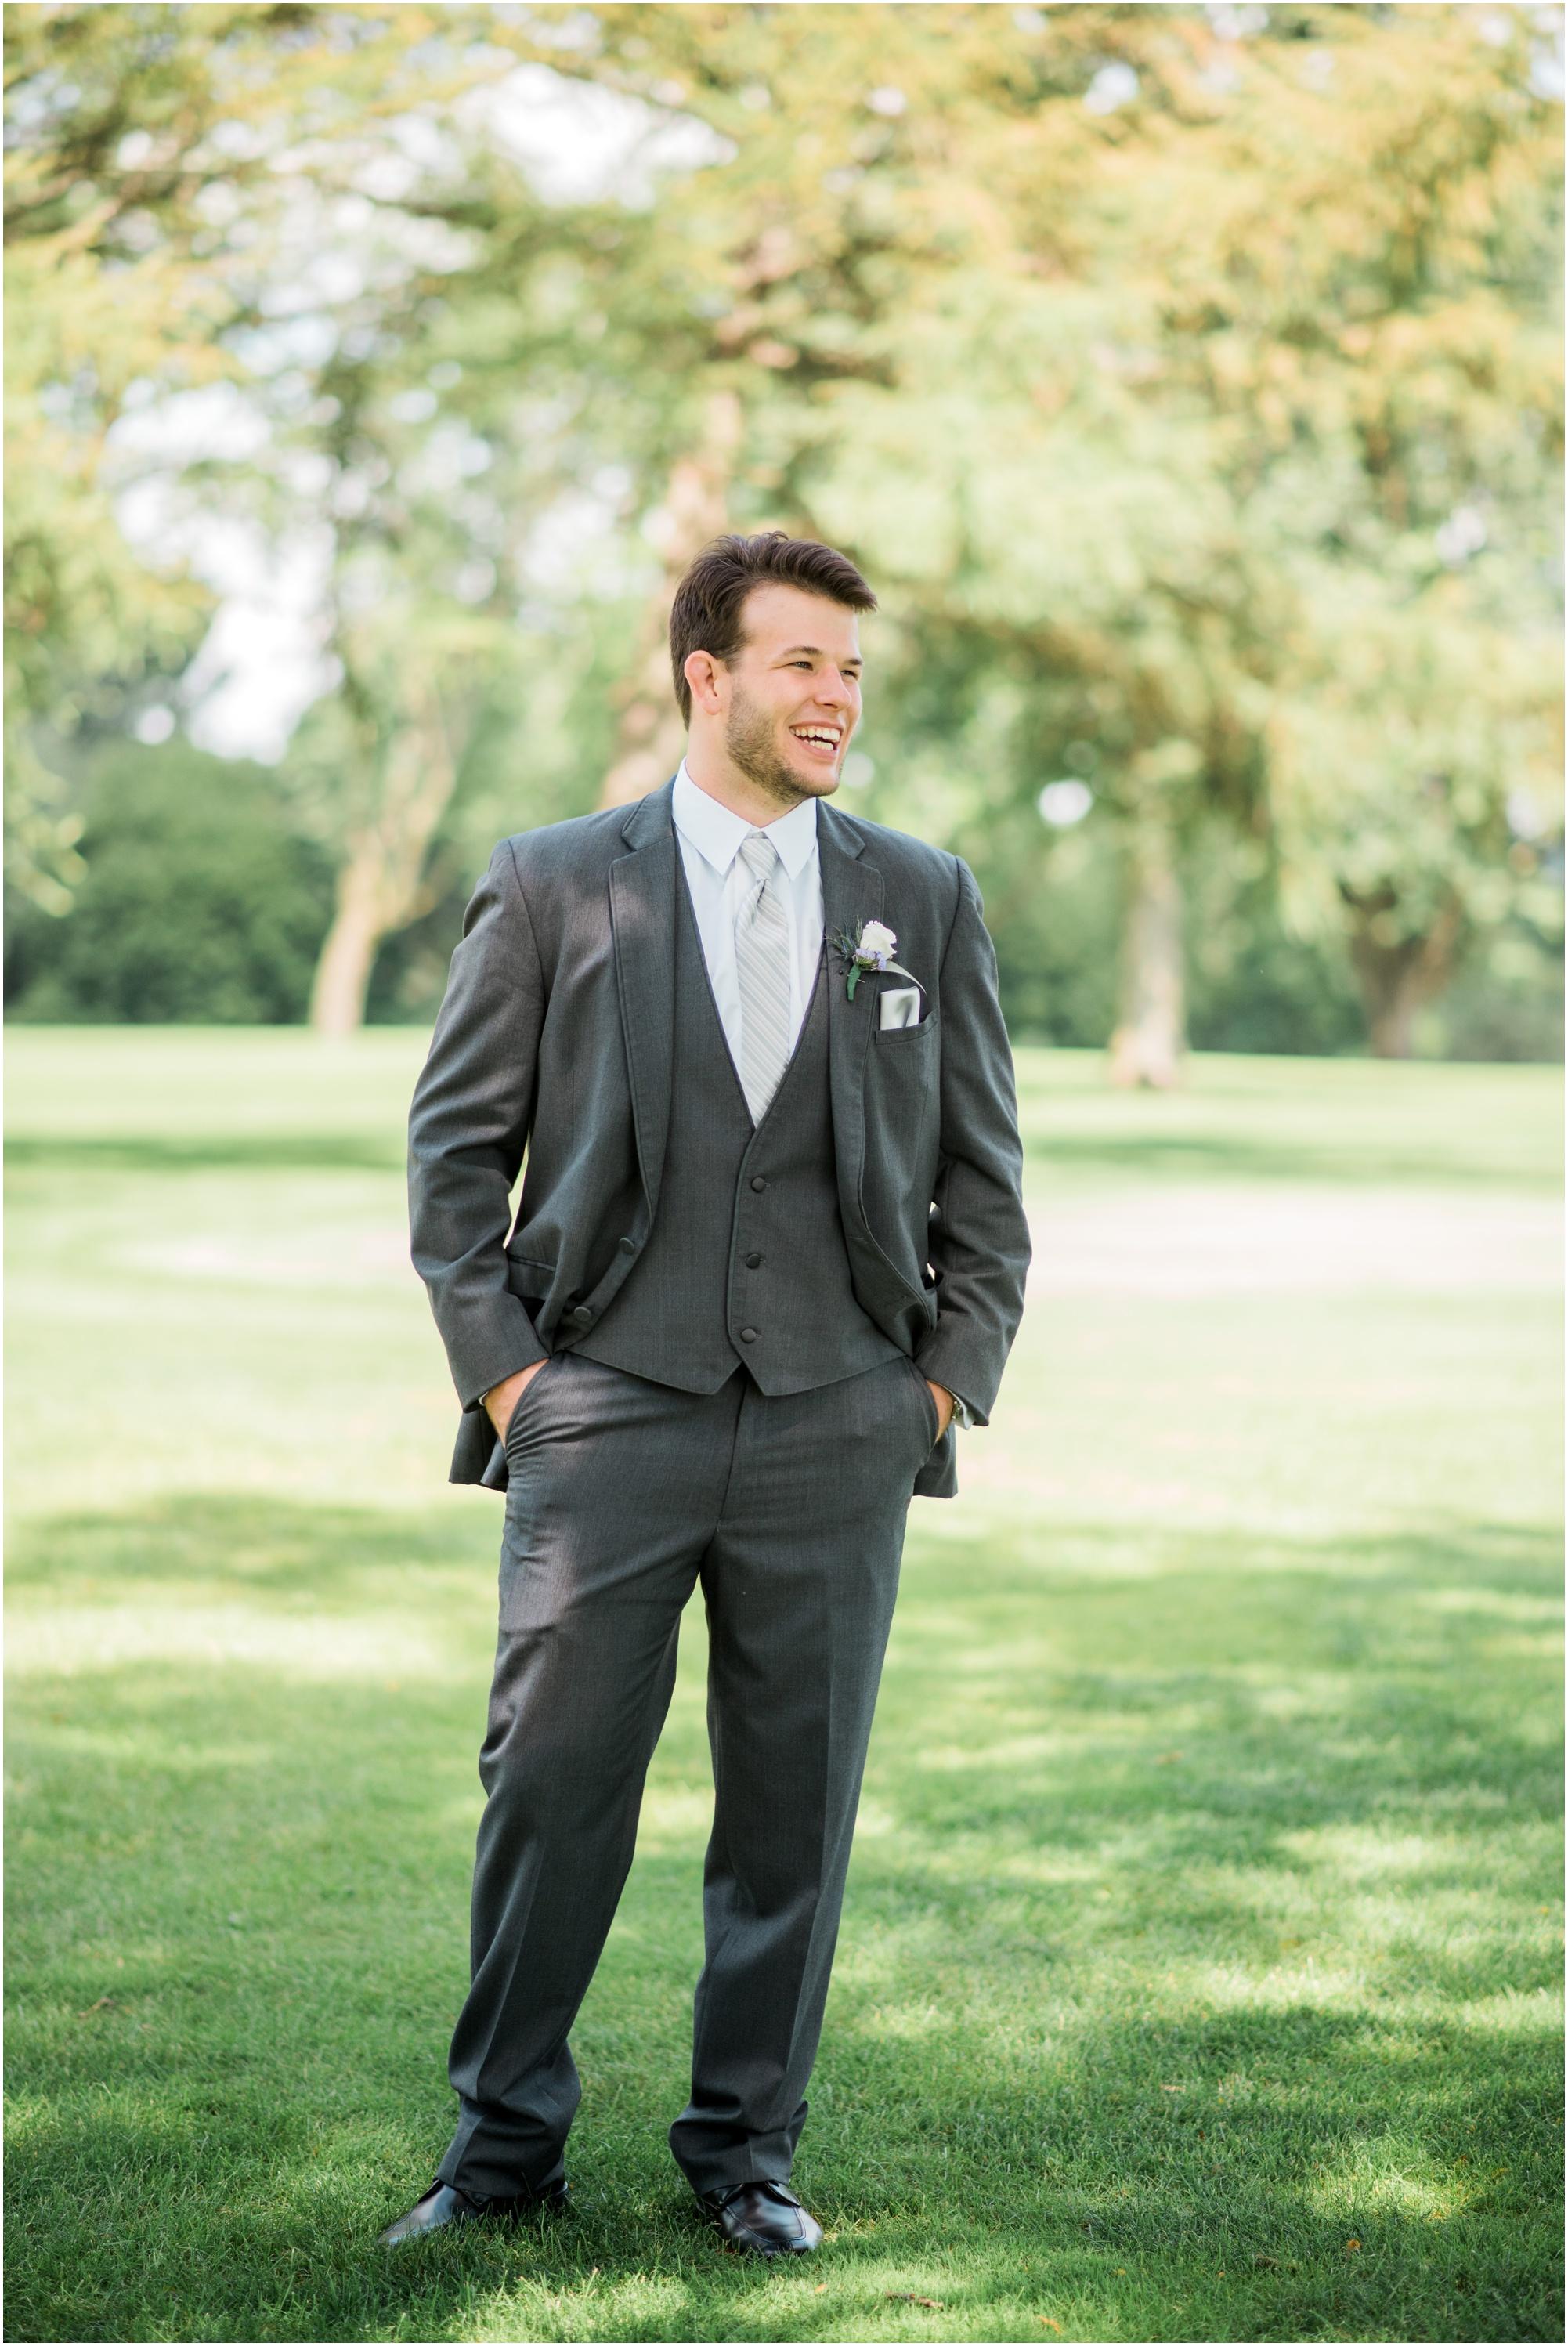 Wisconsin-Wedding-Photographer-Reedsburg-Country-Club-Kaela-and Matt-Wedding-133.jpg